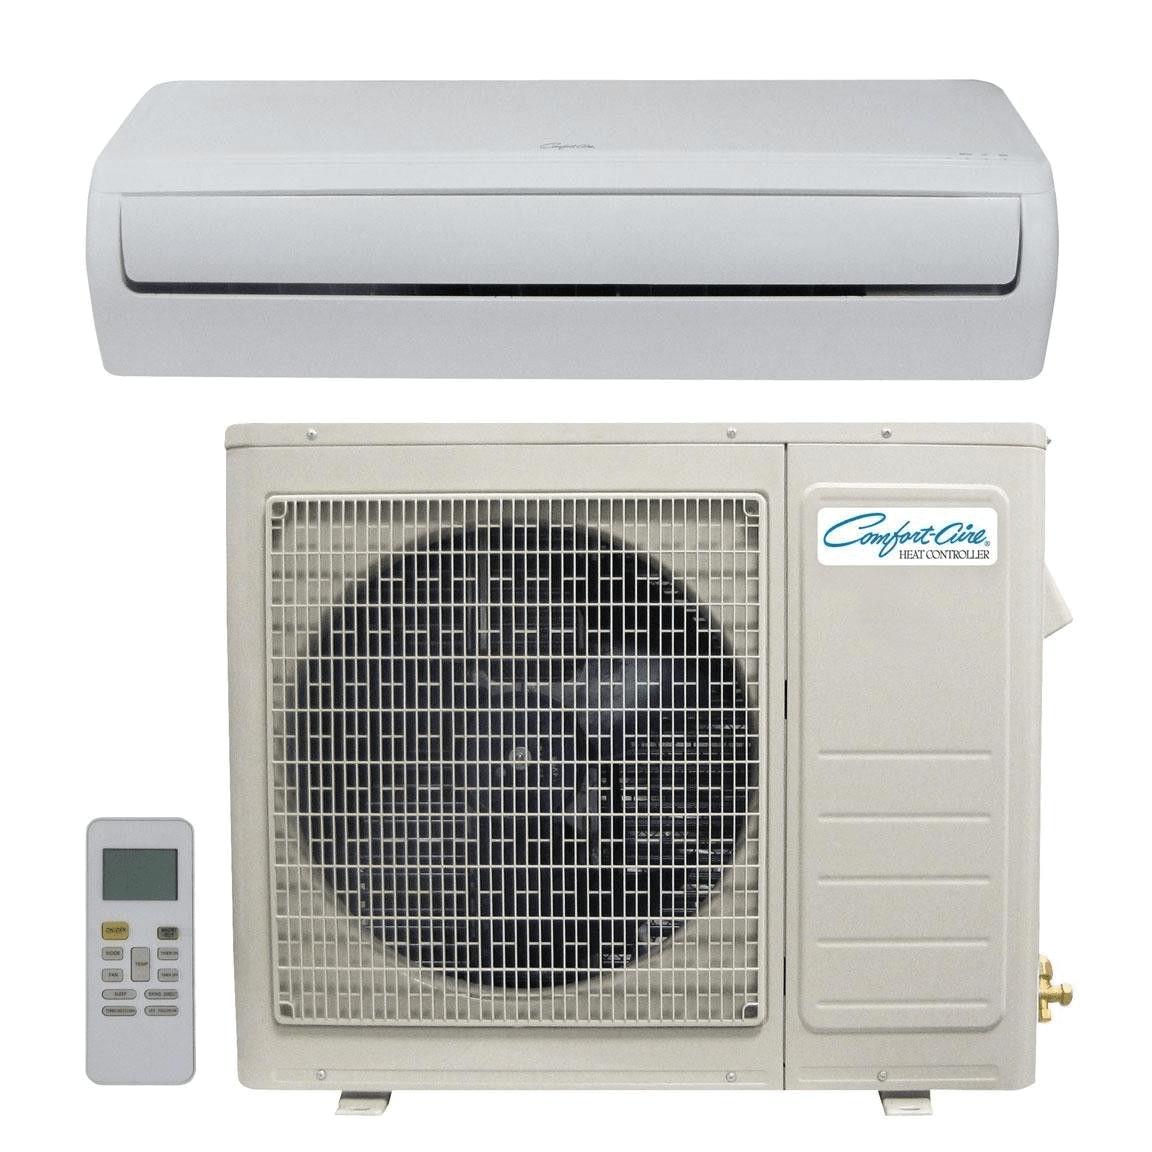 Comfort-aire Dvh09sd-0 9,000 Btu Mini Split Heat Pump